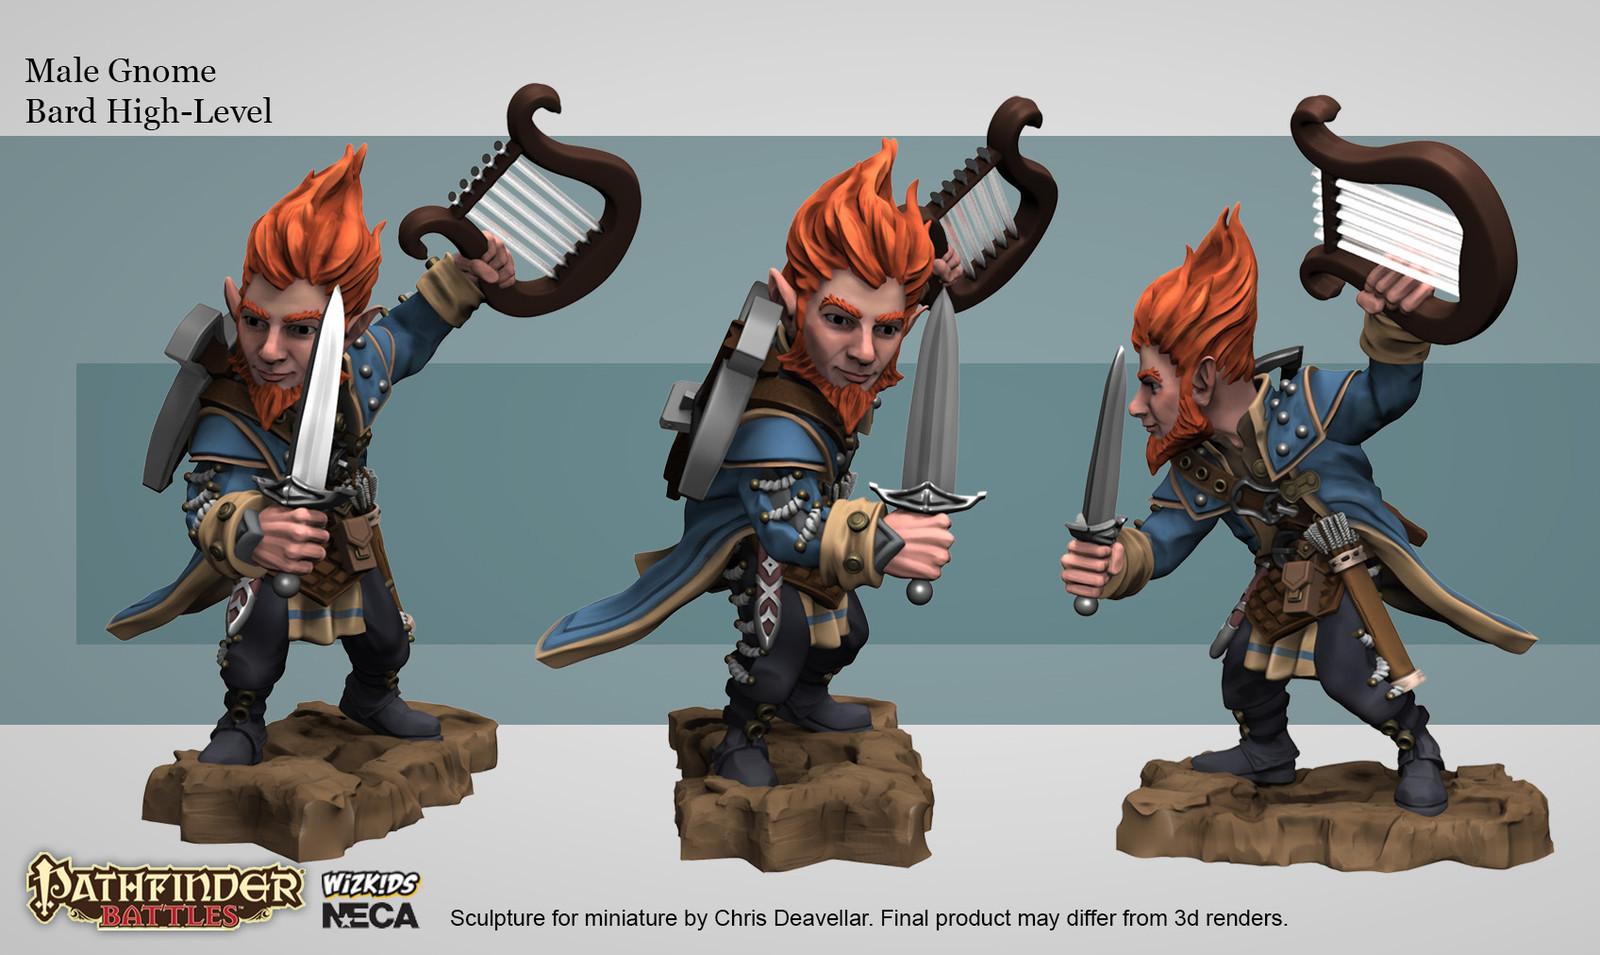 Pathfinder Deep Cuts Unpainted Miniatures